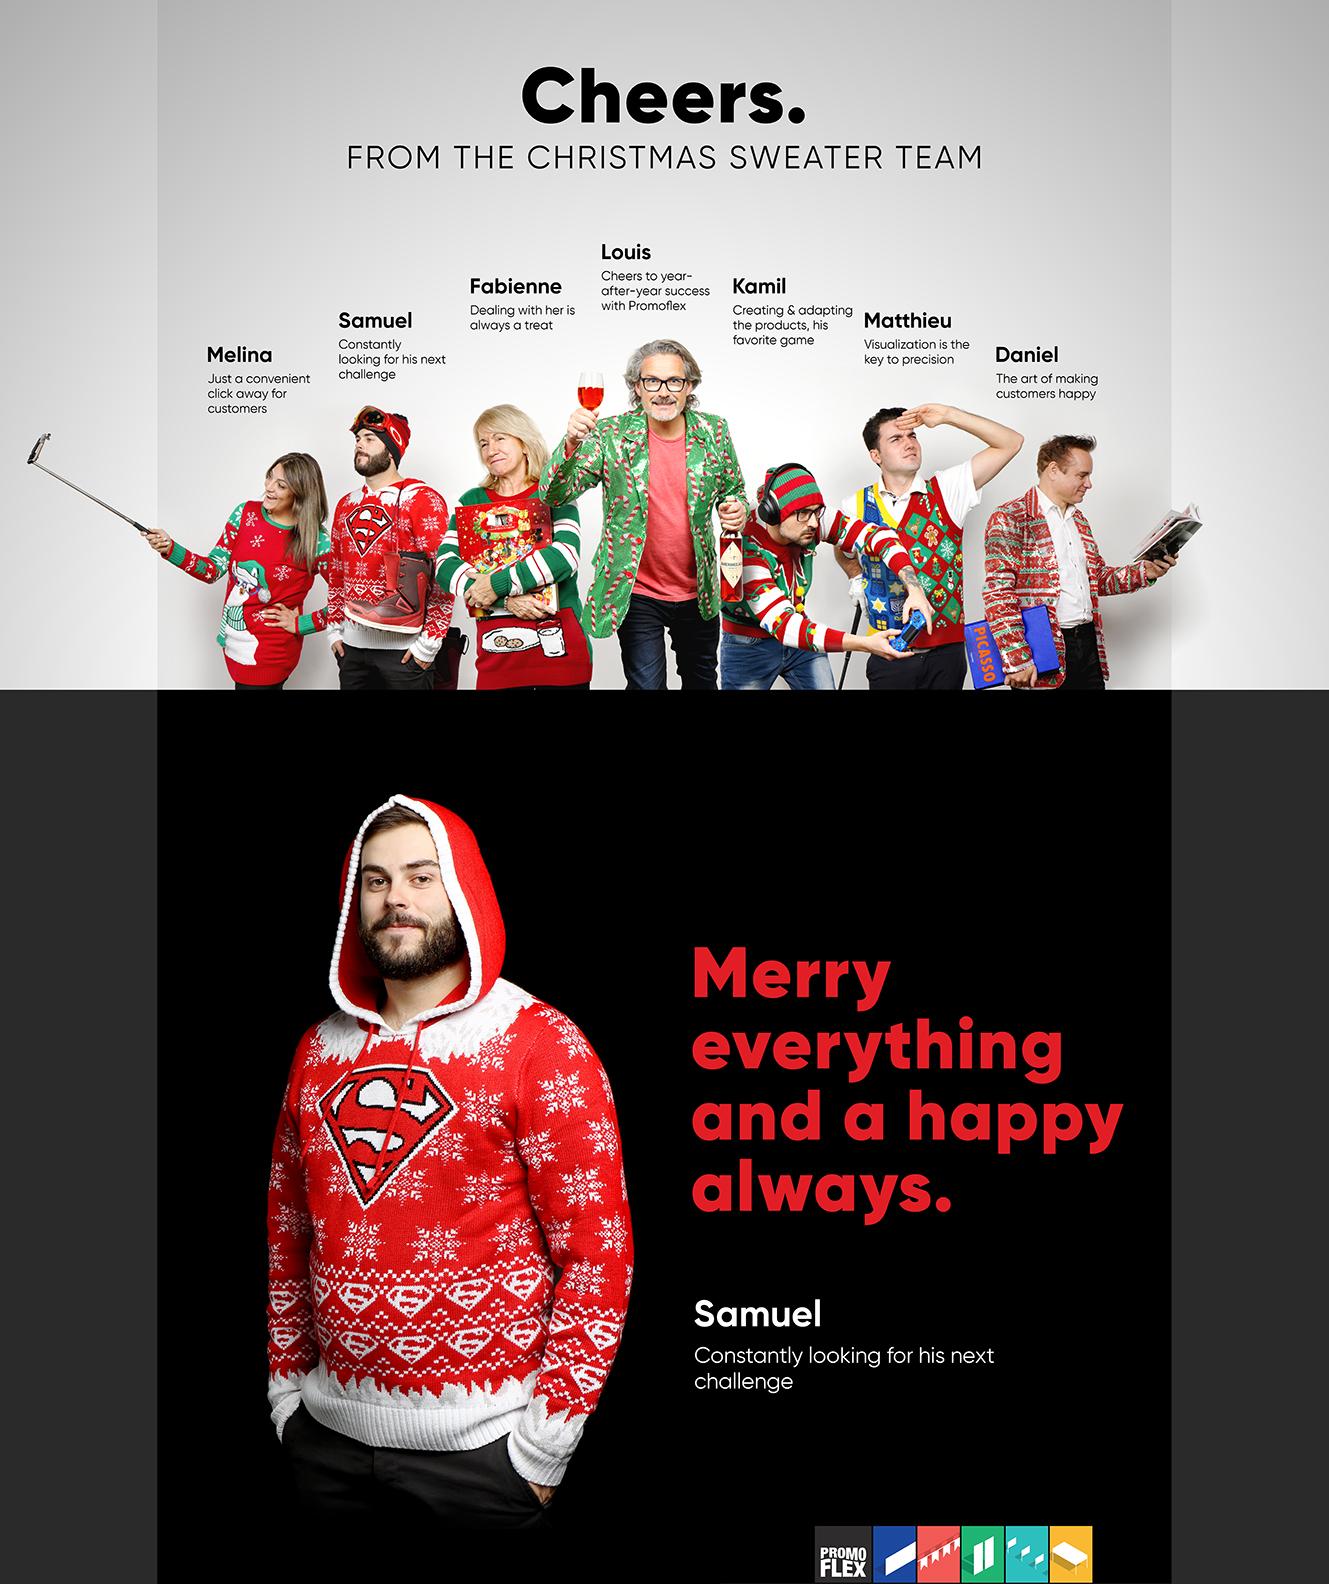 Holiday_sending_2018_grp_samuel_en.jpg (998 KB)